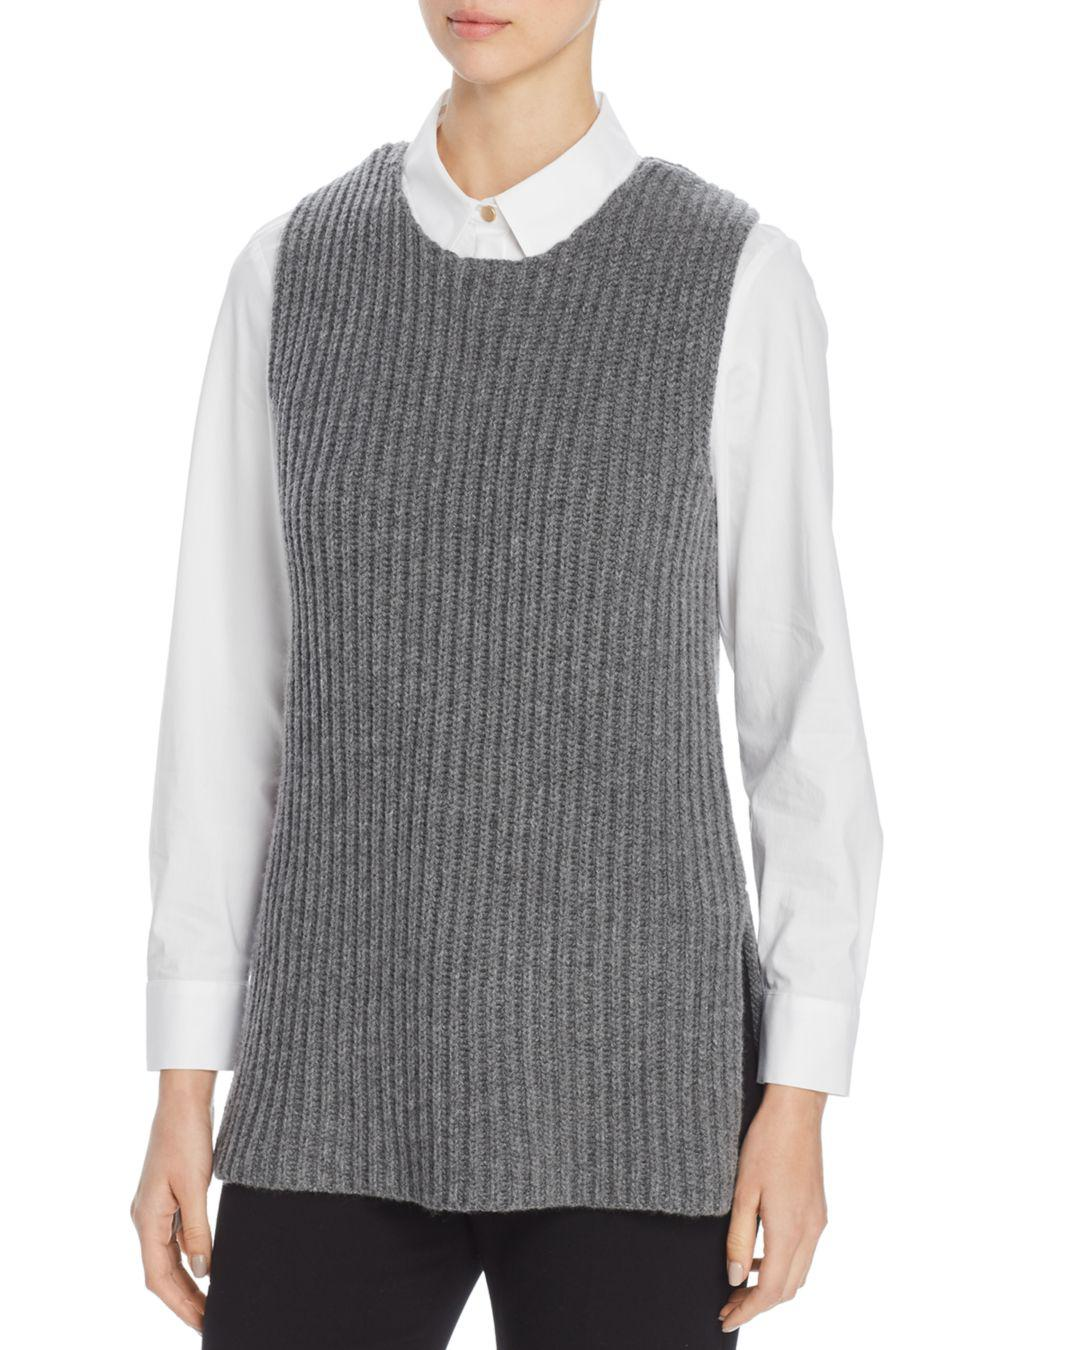 a6fd403b4d12 Lyst - Tory Burch Sleeveless Sweater in Gray